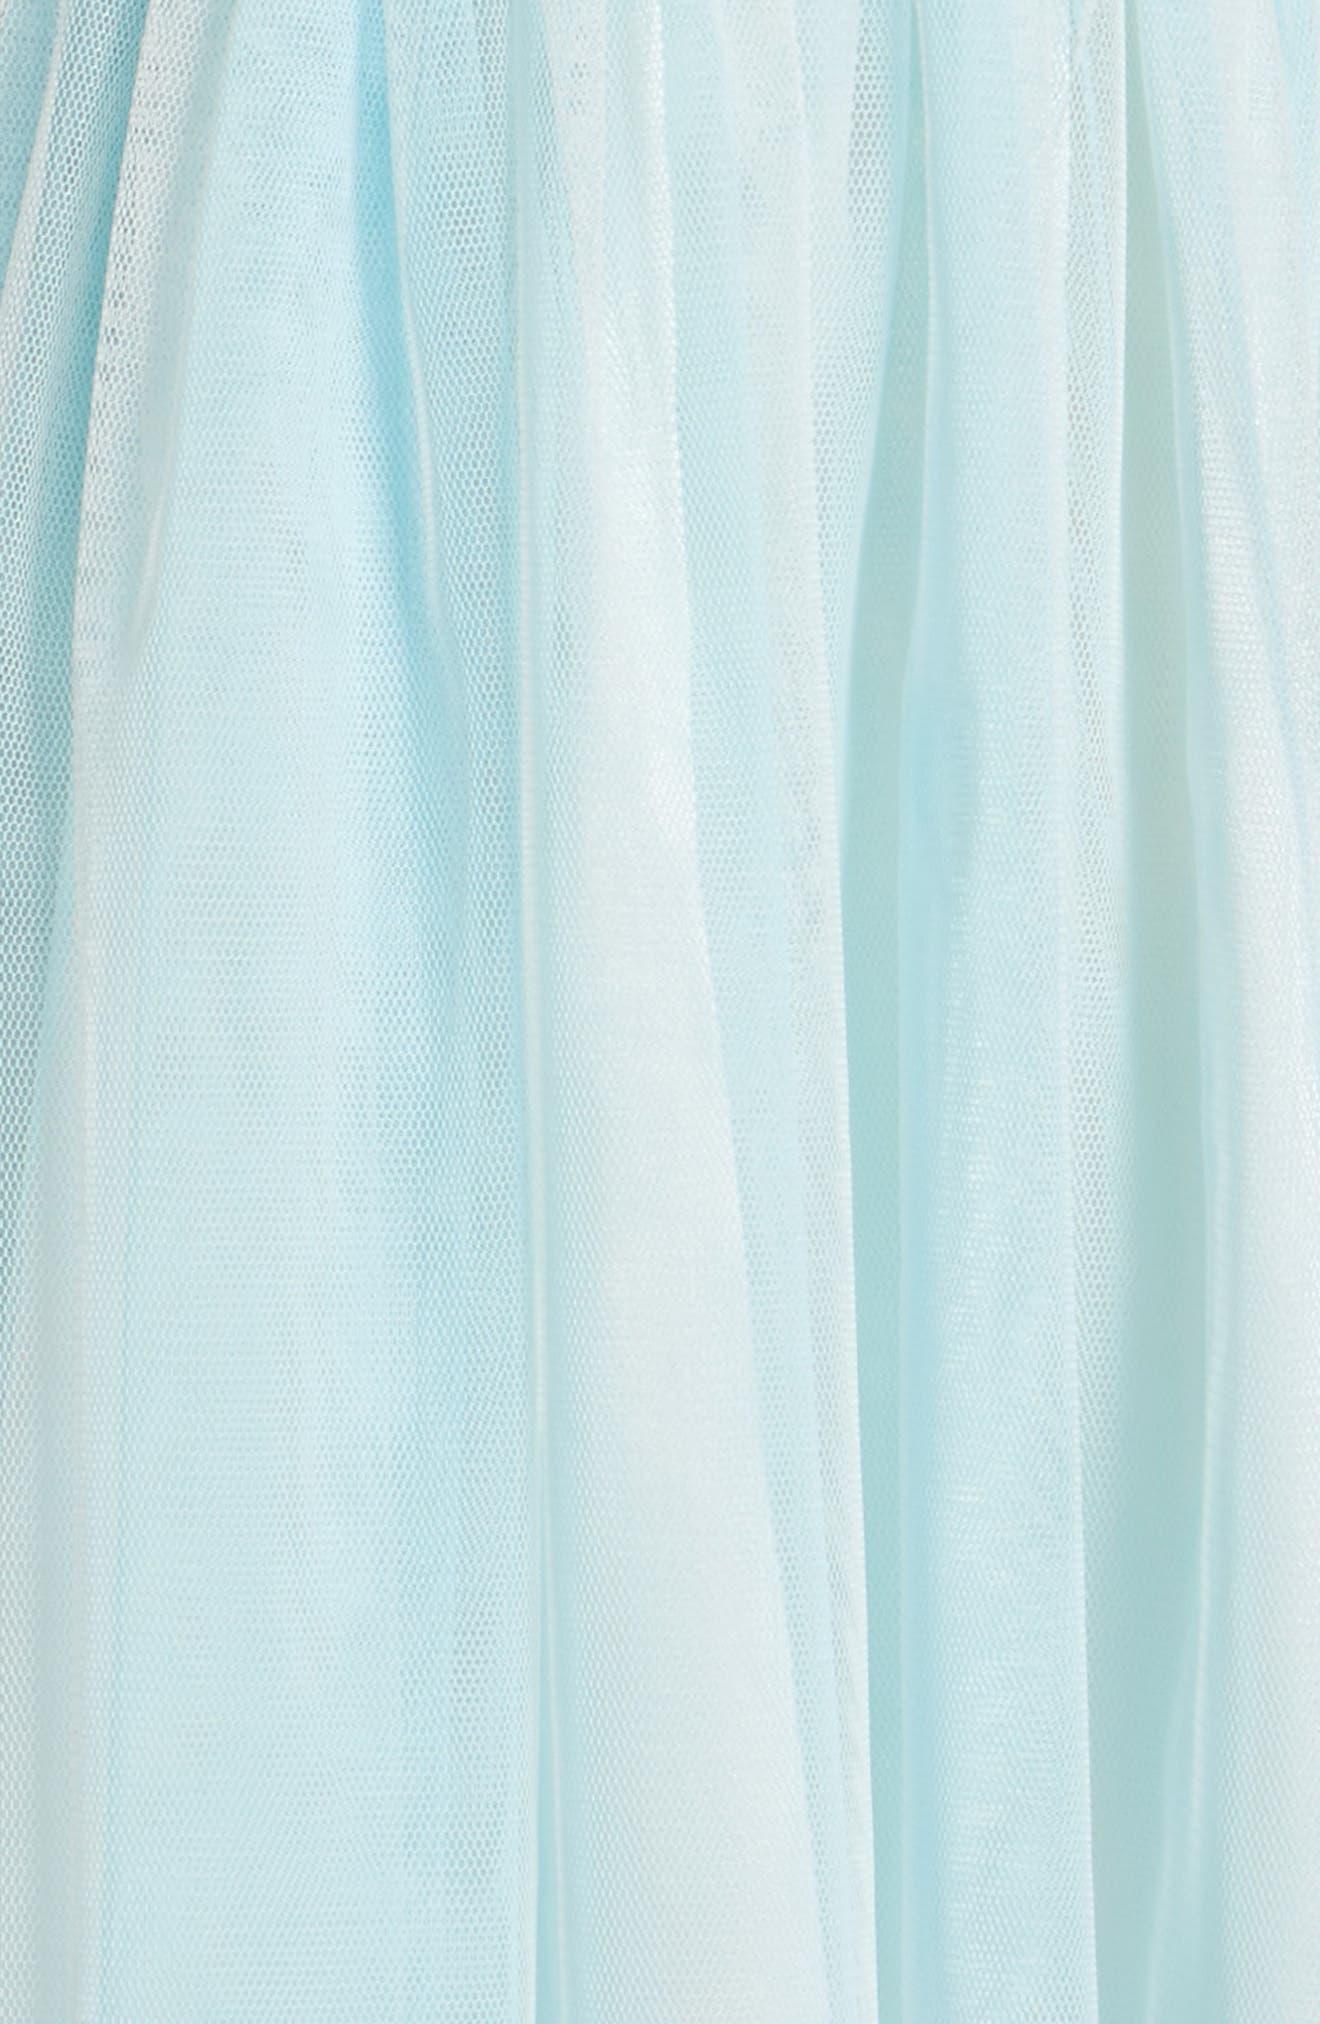 Sleeveless Floral Dress,                             Alternate thumbnail 3, color,                             BLUE